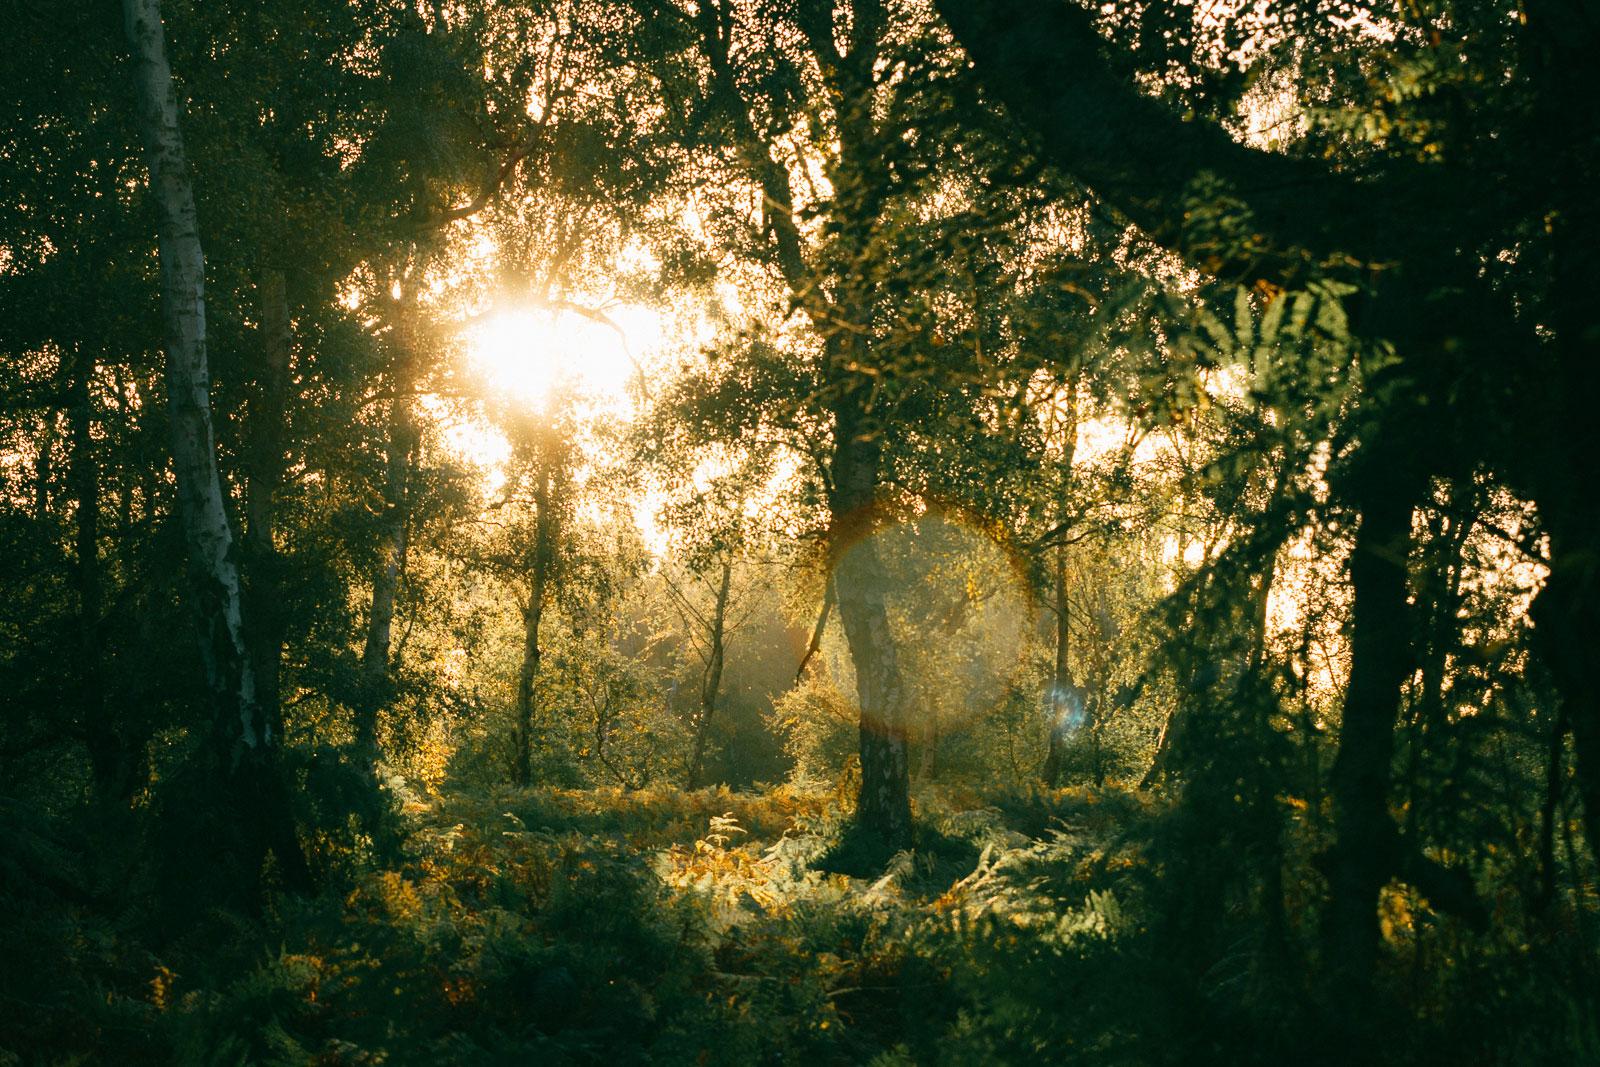 Holme Fen sunset ferns, forest, trees